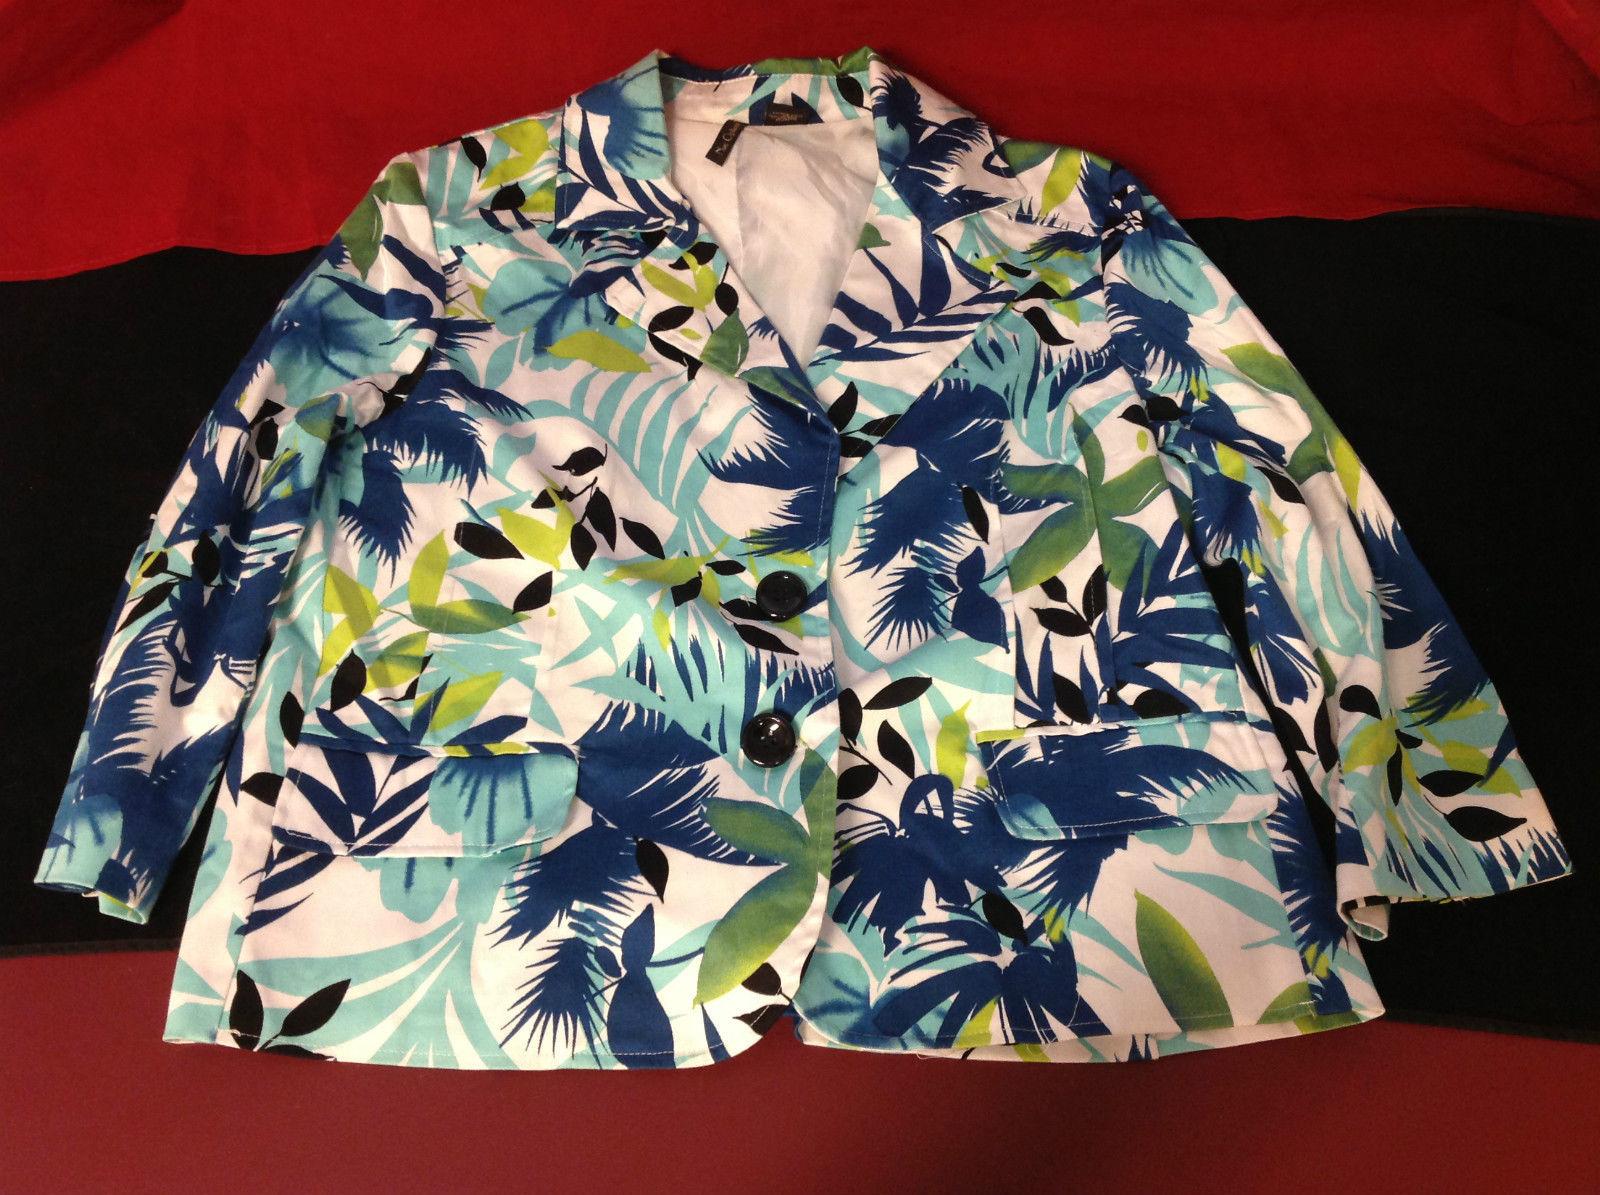 Nue Options Ladies Flowered Blazer White/Blue/Green/Black Size Large